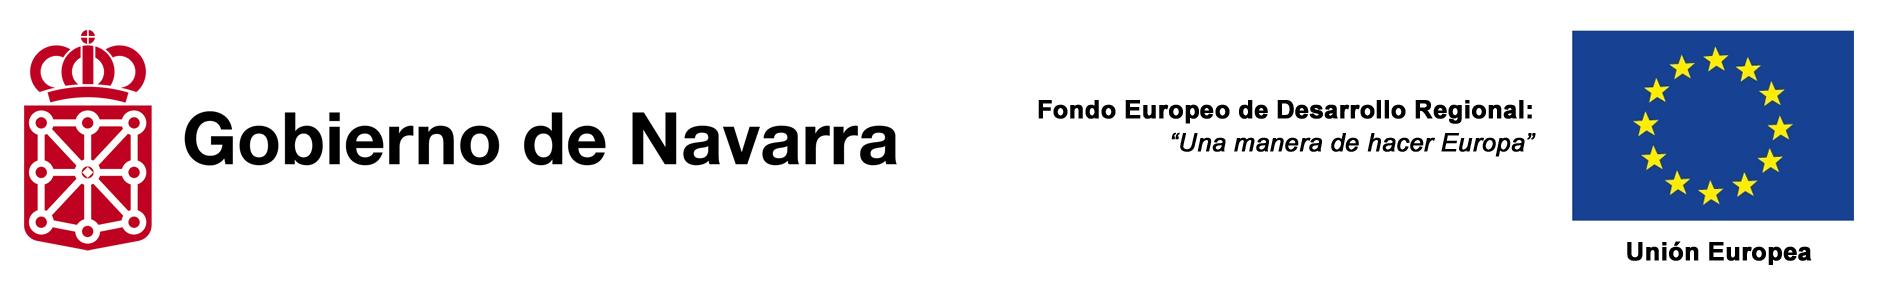 Logo FEDER GN castellano